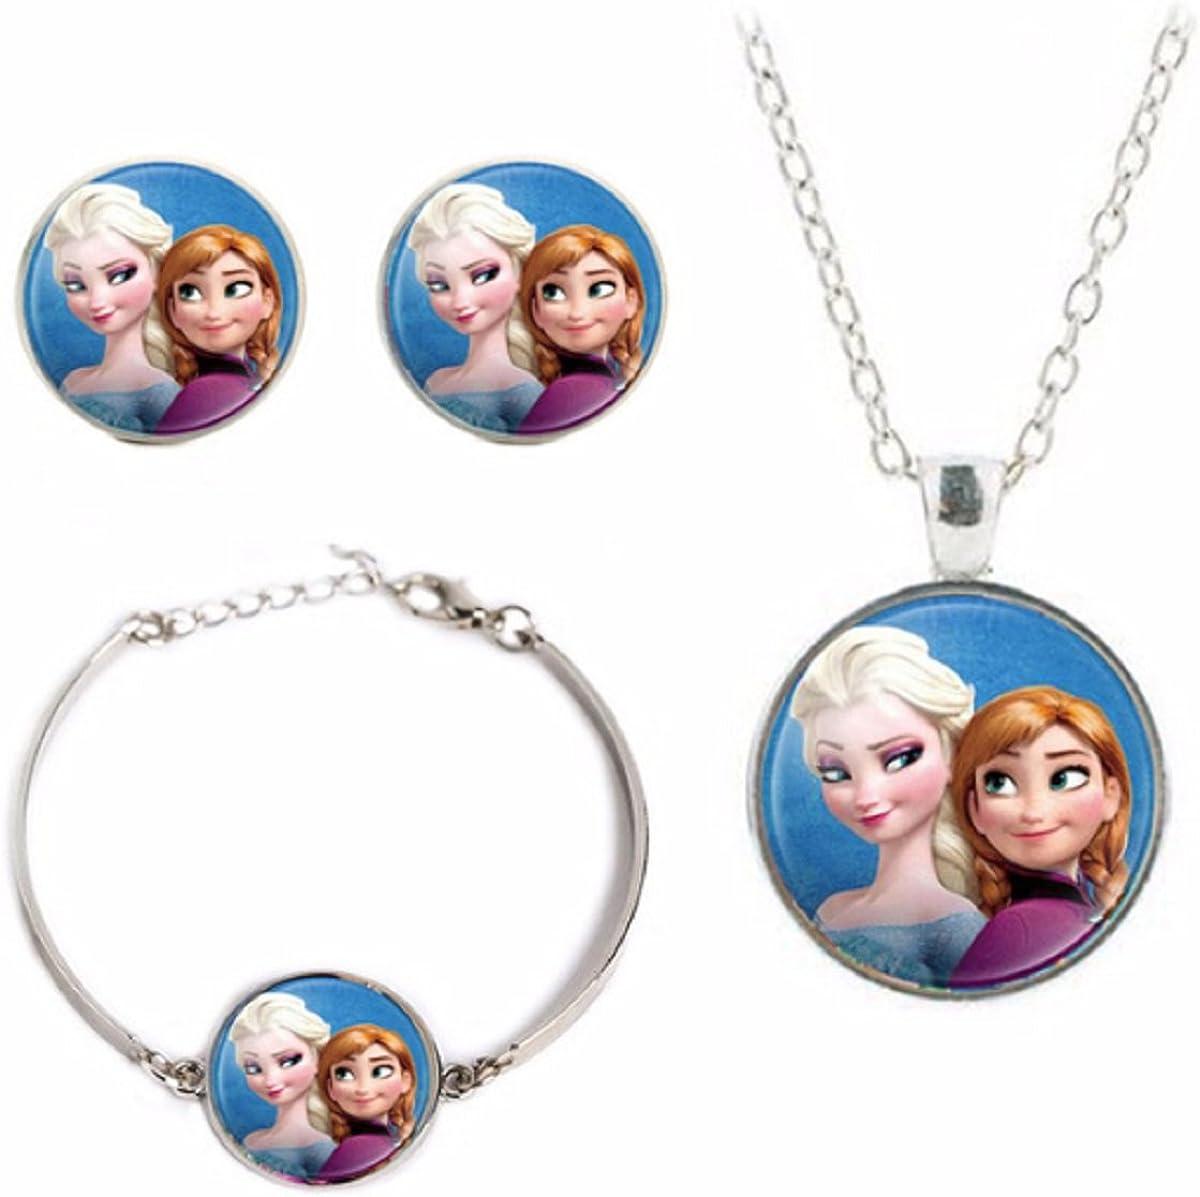 Disney's Princesses Glass Domed Pendant Necklace, Earring, Braclet Jewelry Set (Elsa & Anna)